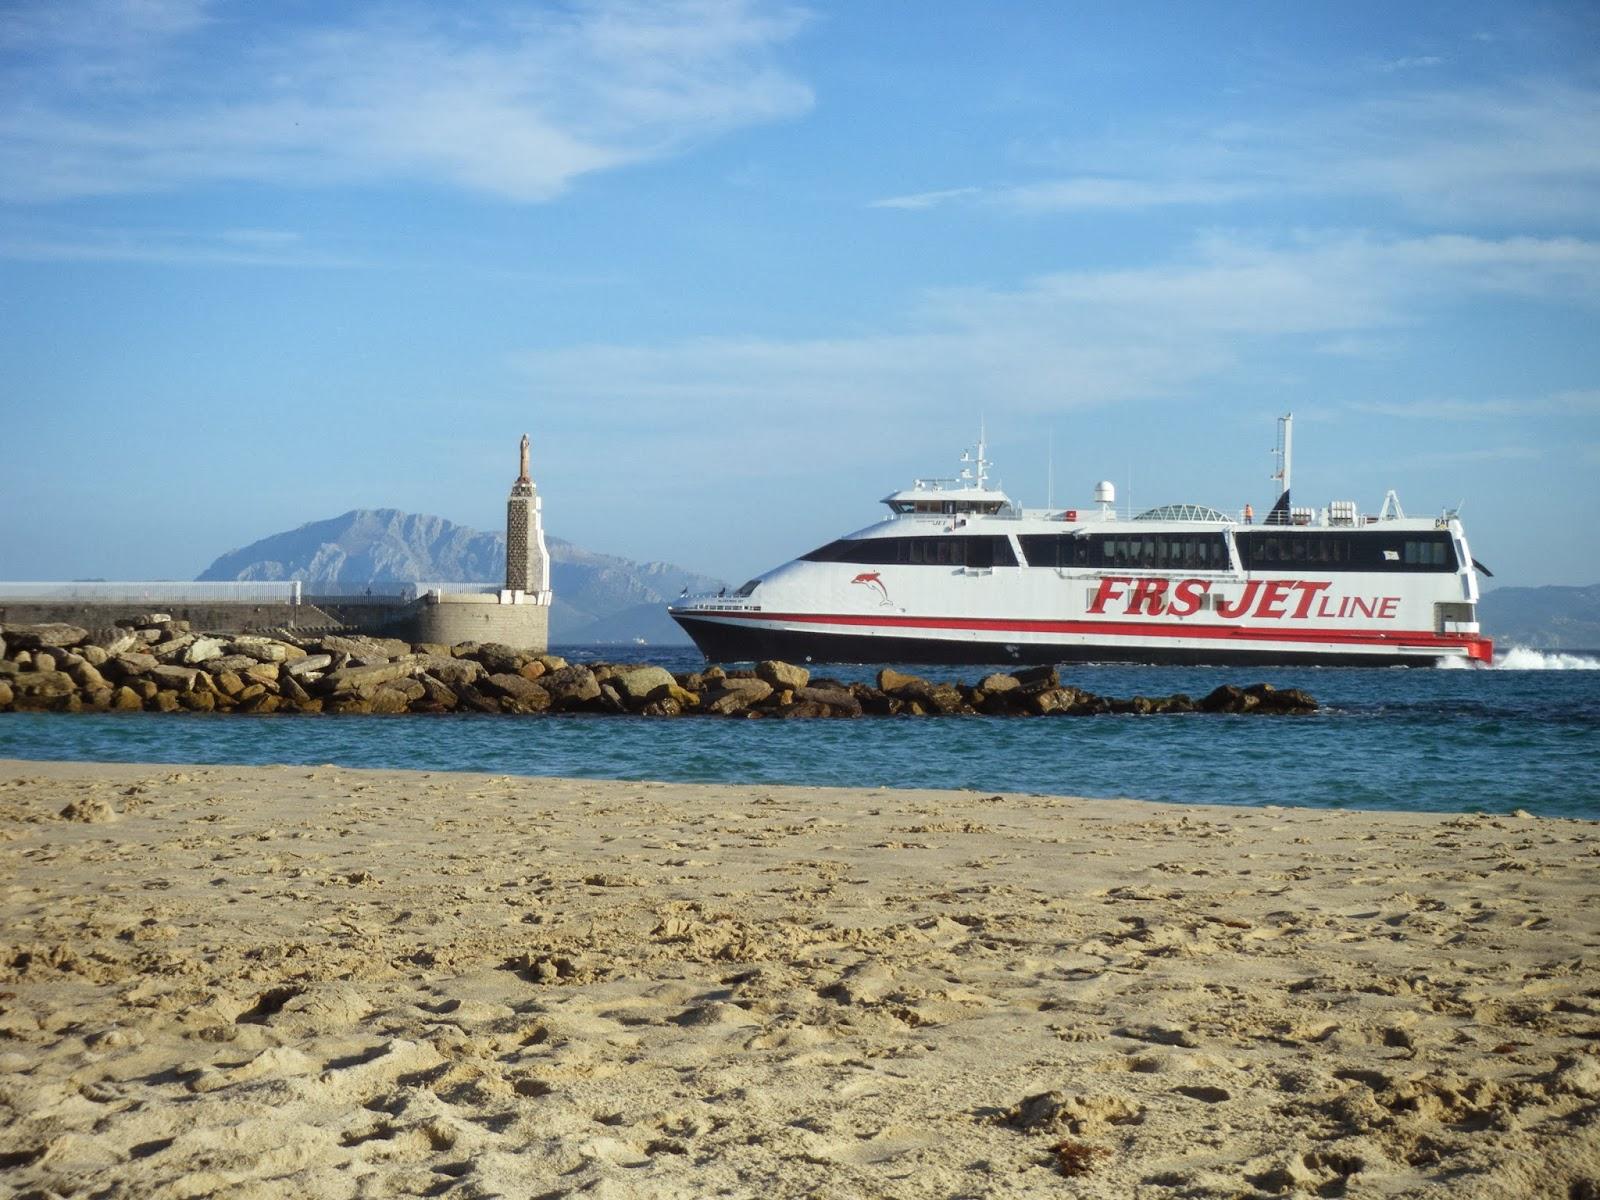 Puerto de Tarifa. Ferry FRS entrando